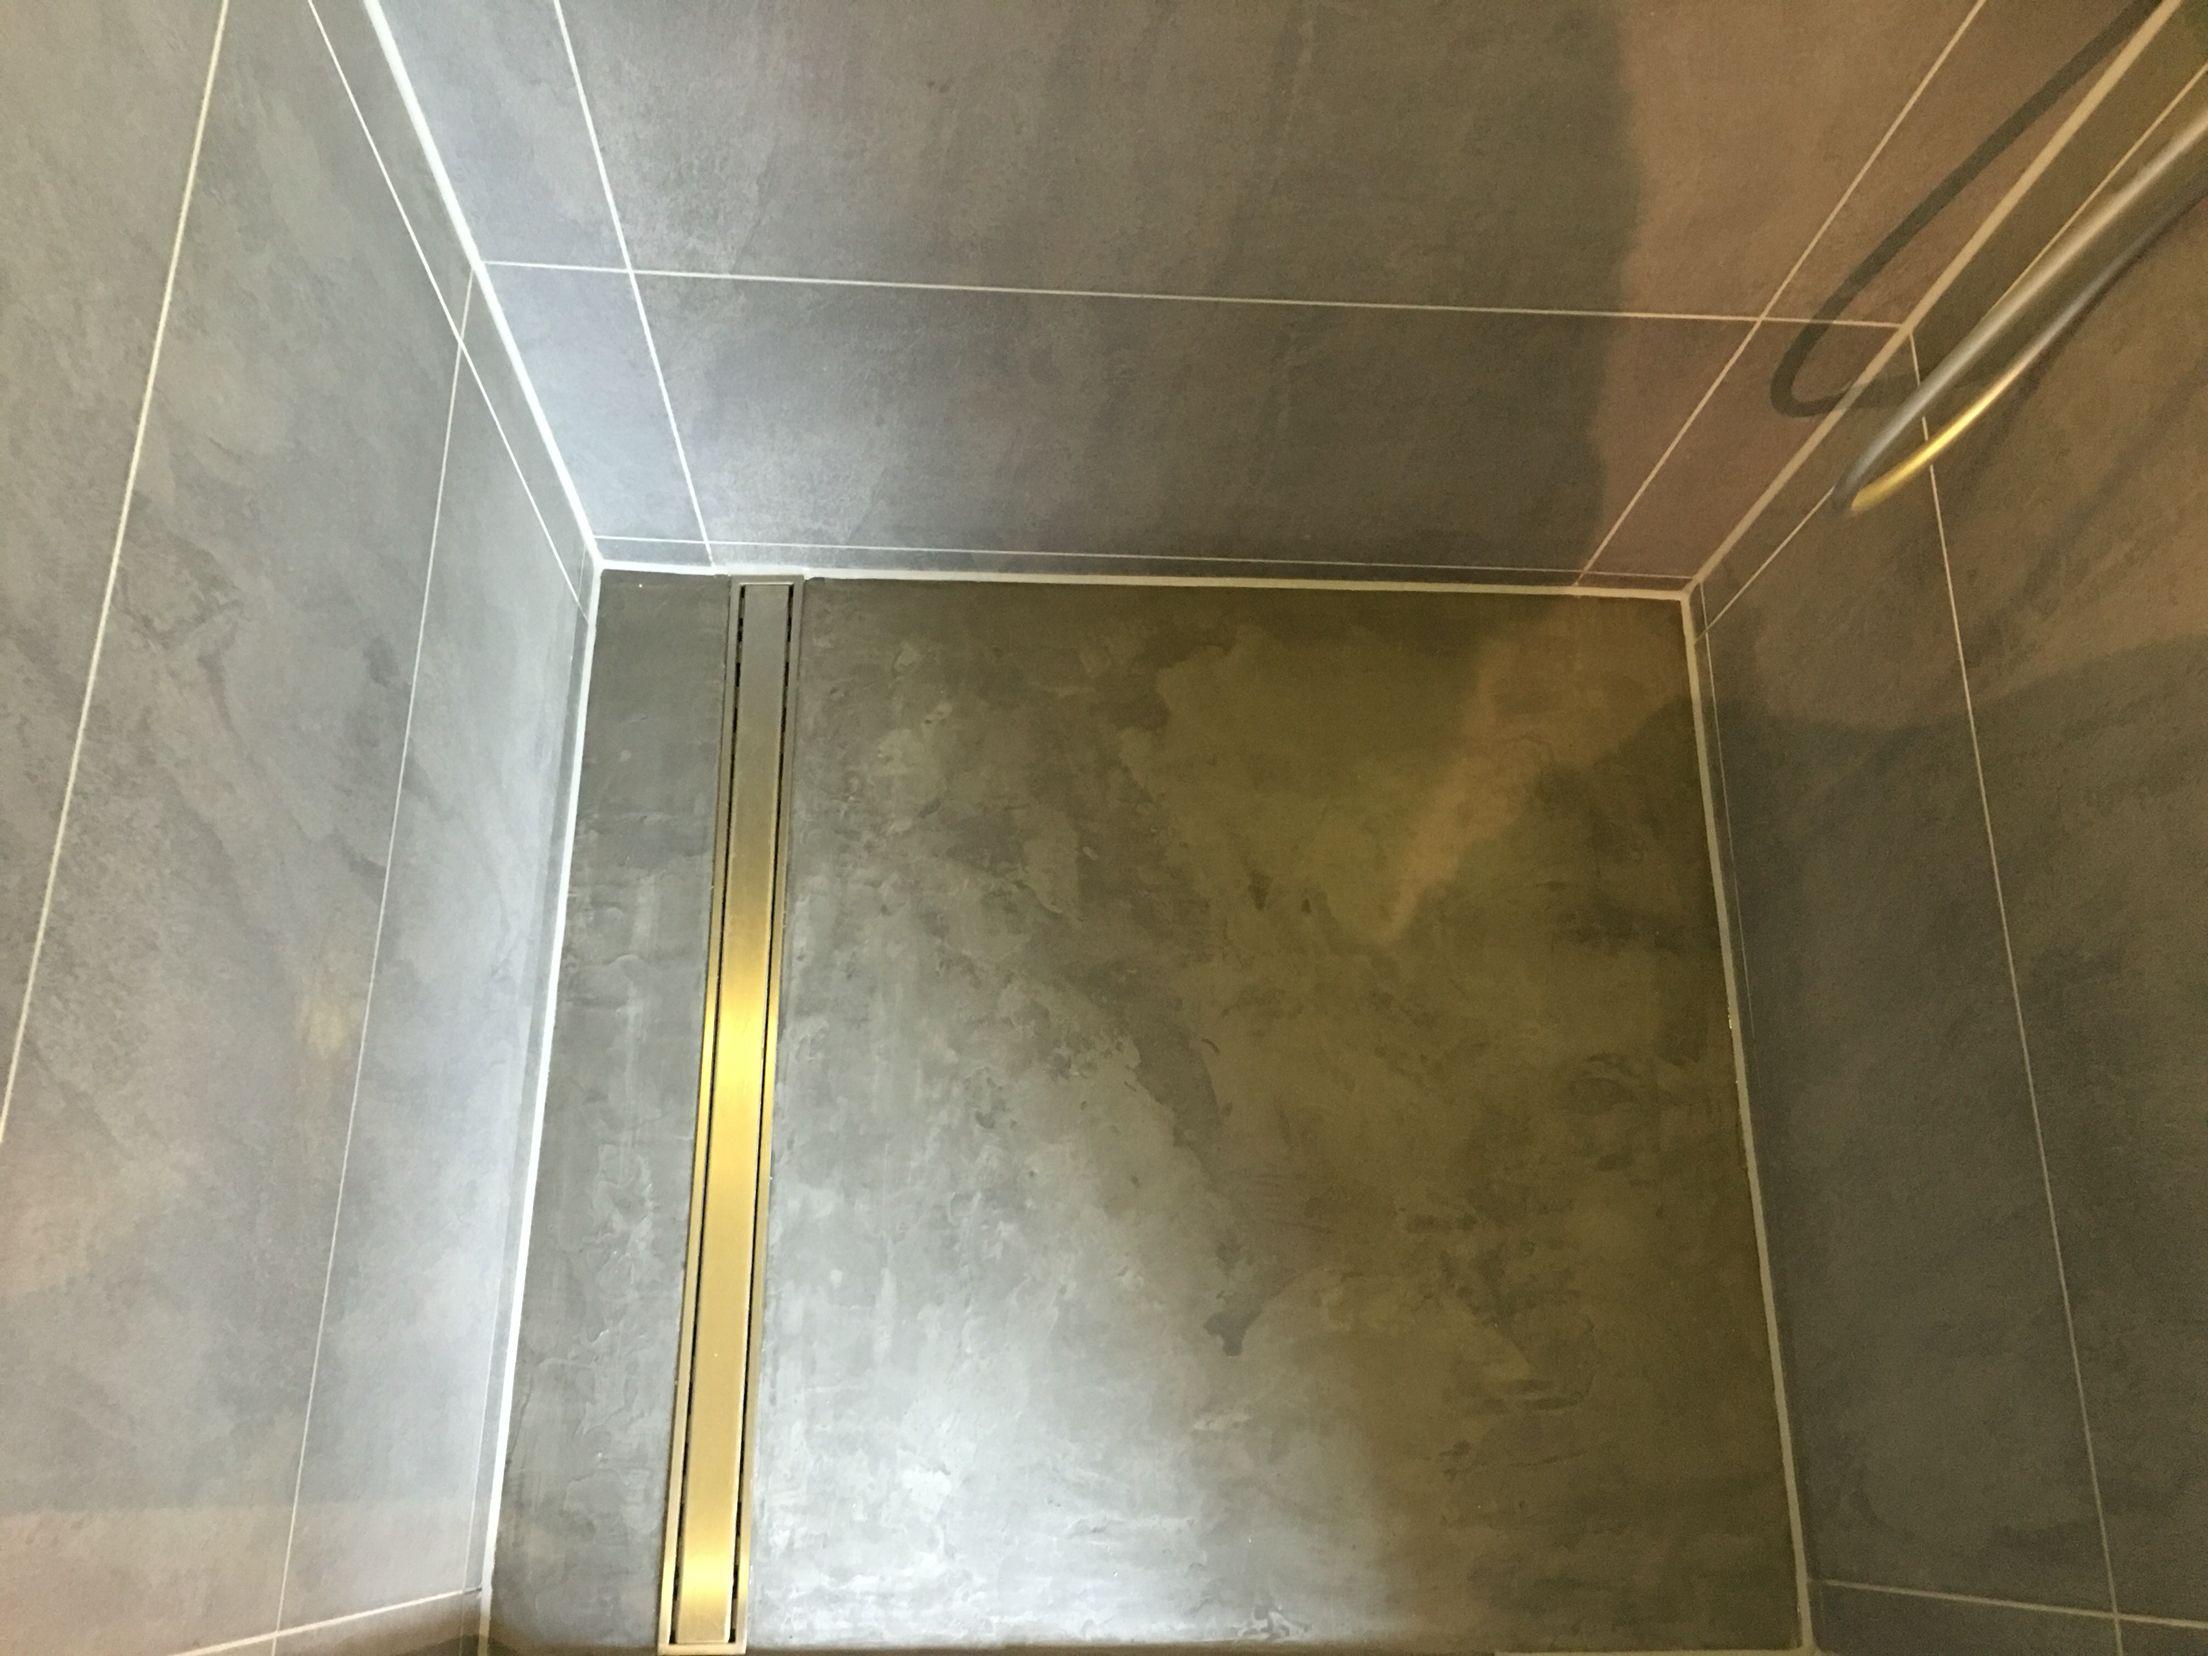 Badezimmer Braunschweig ~ 8 besten beton ciré bilder auf pinterest badezimmer badezimmer